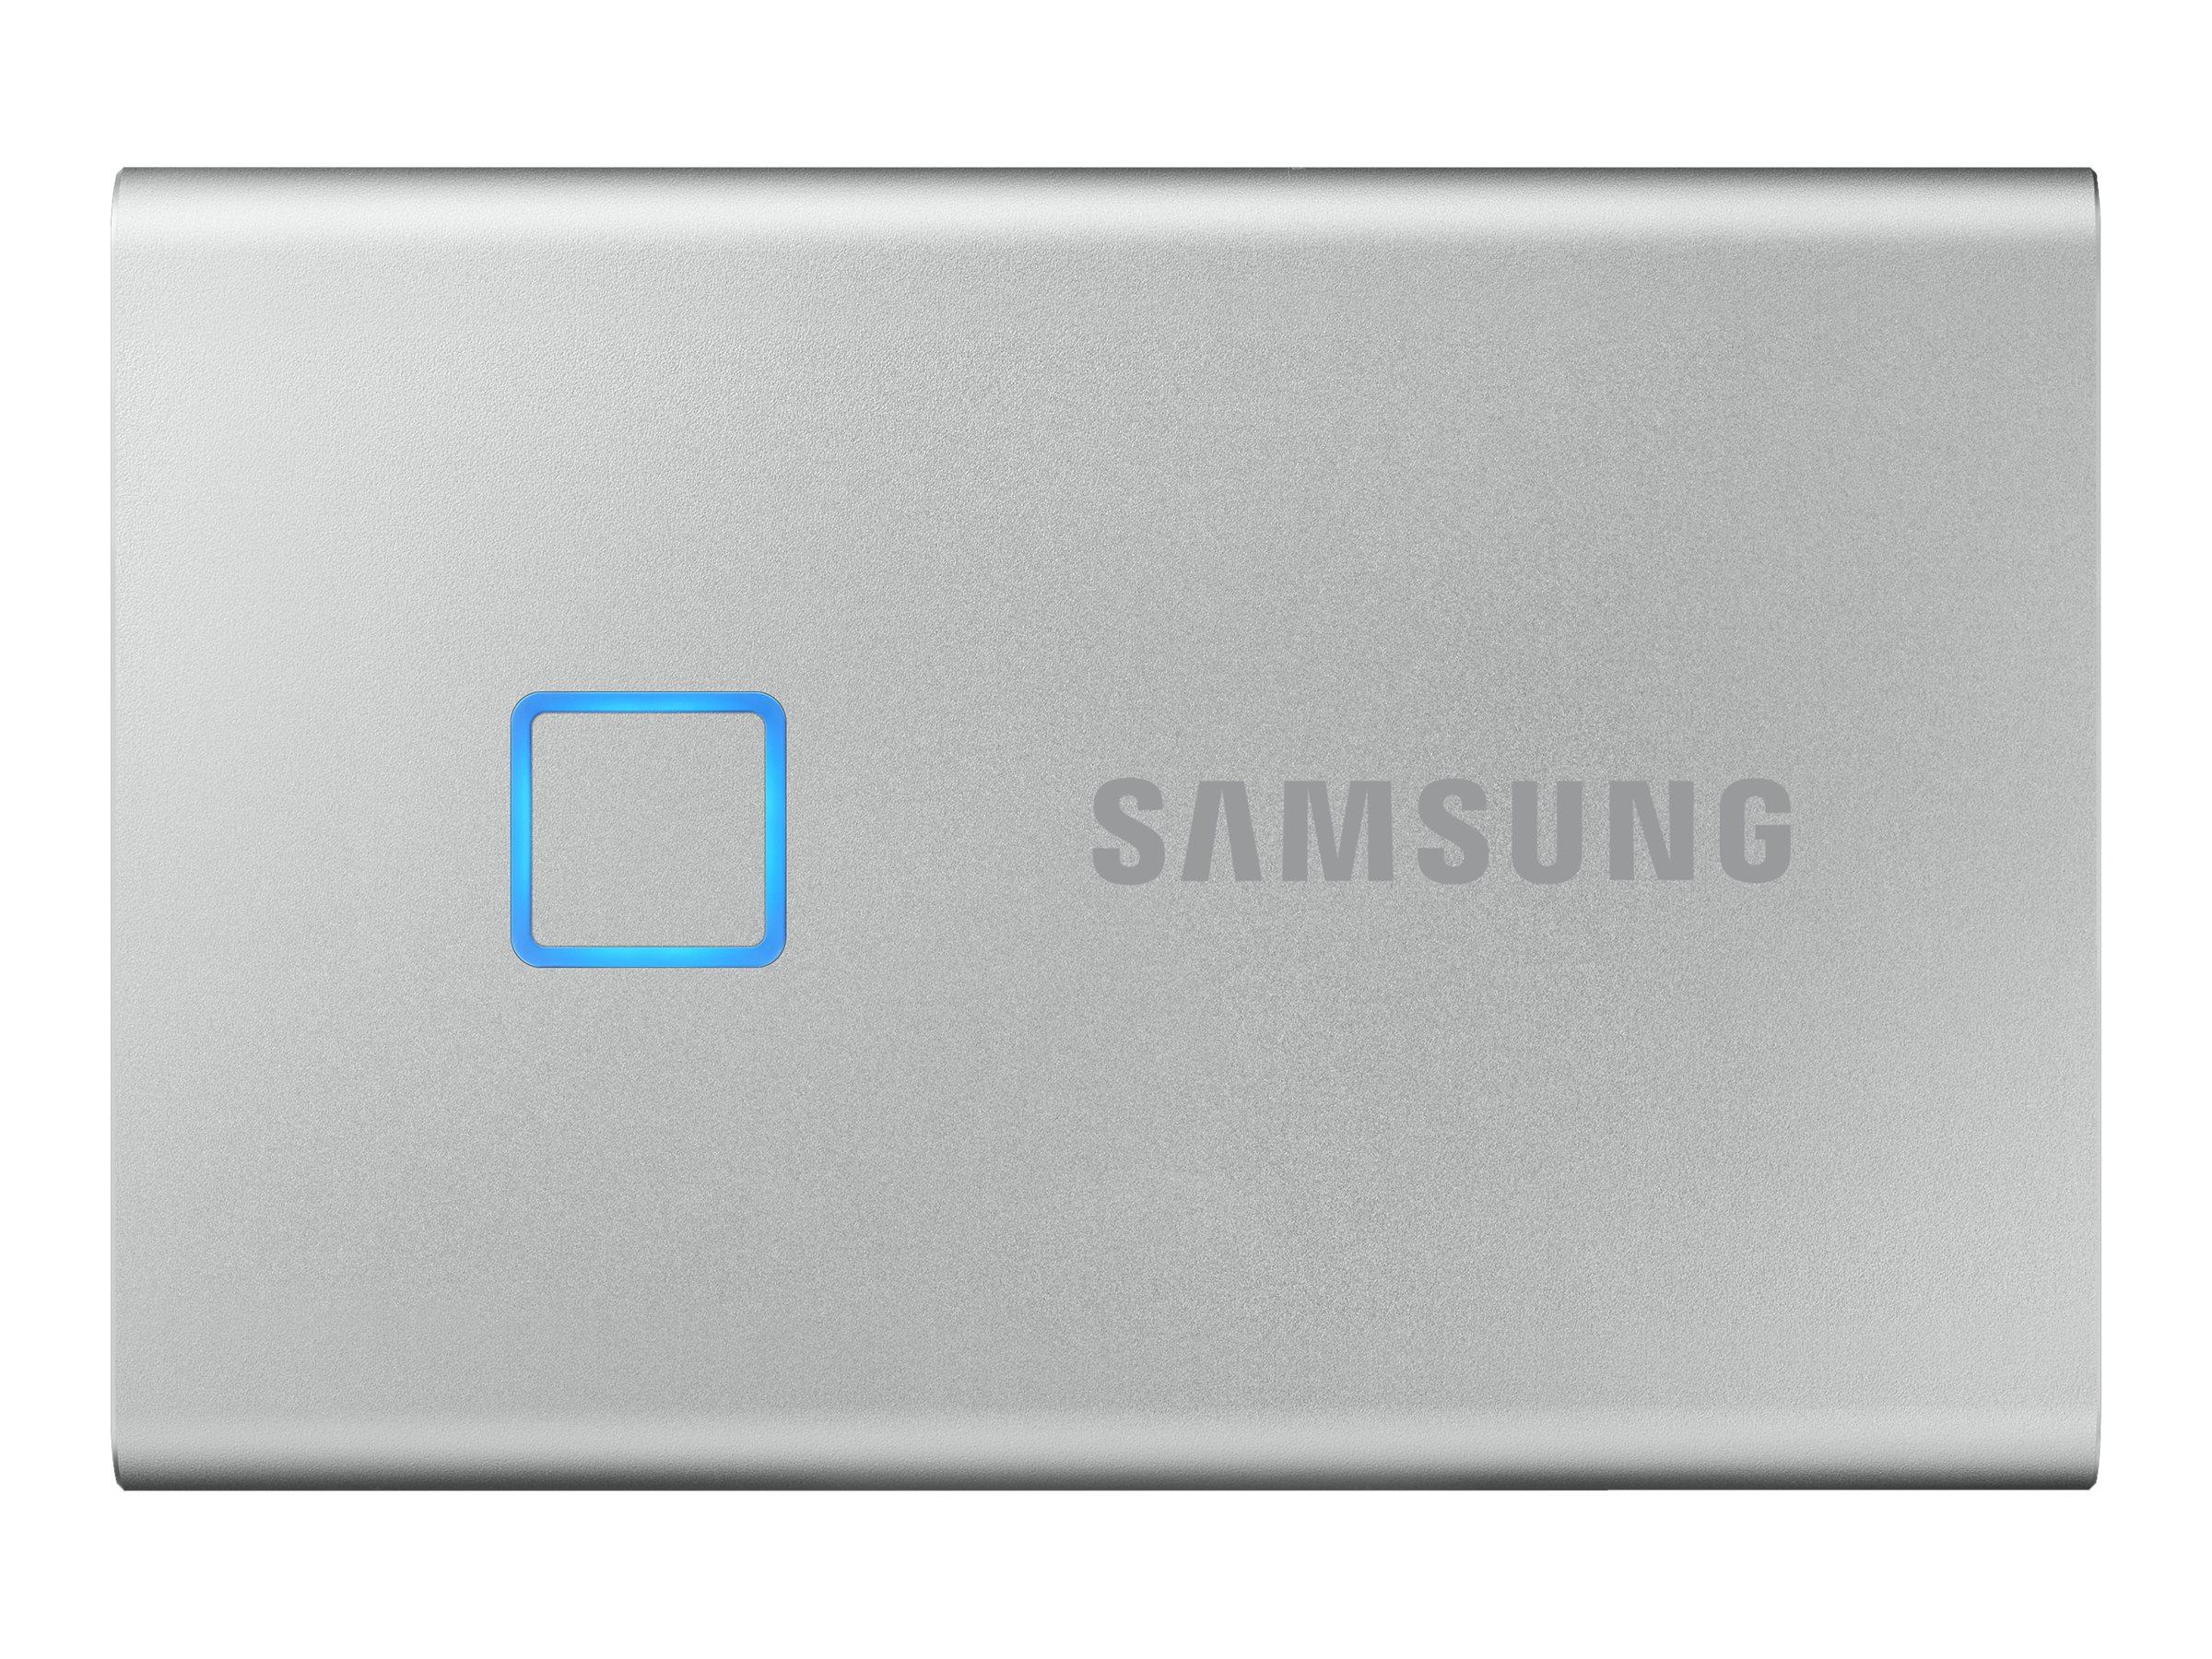 Samsung Portable SSD T7 Touch MU-PC500S - 500 GB SSD - extern (tragbar)